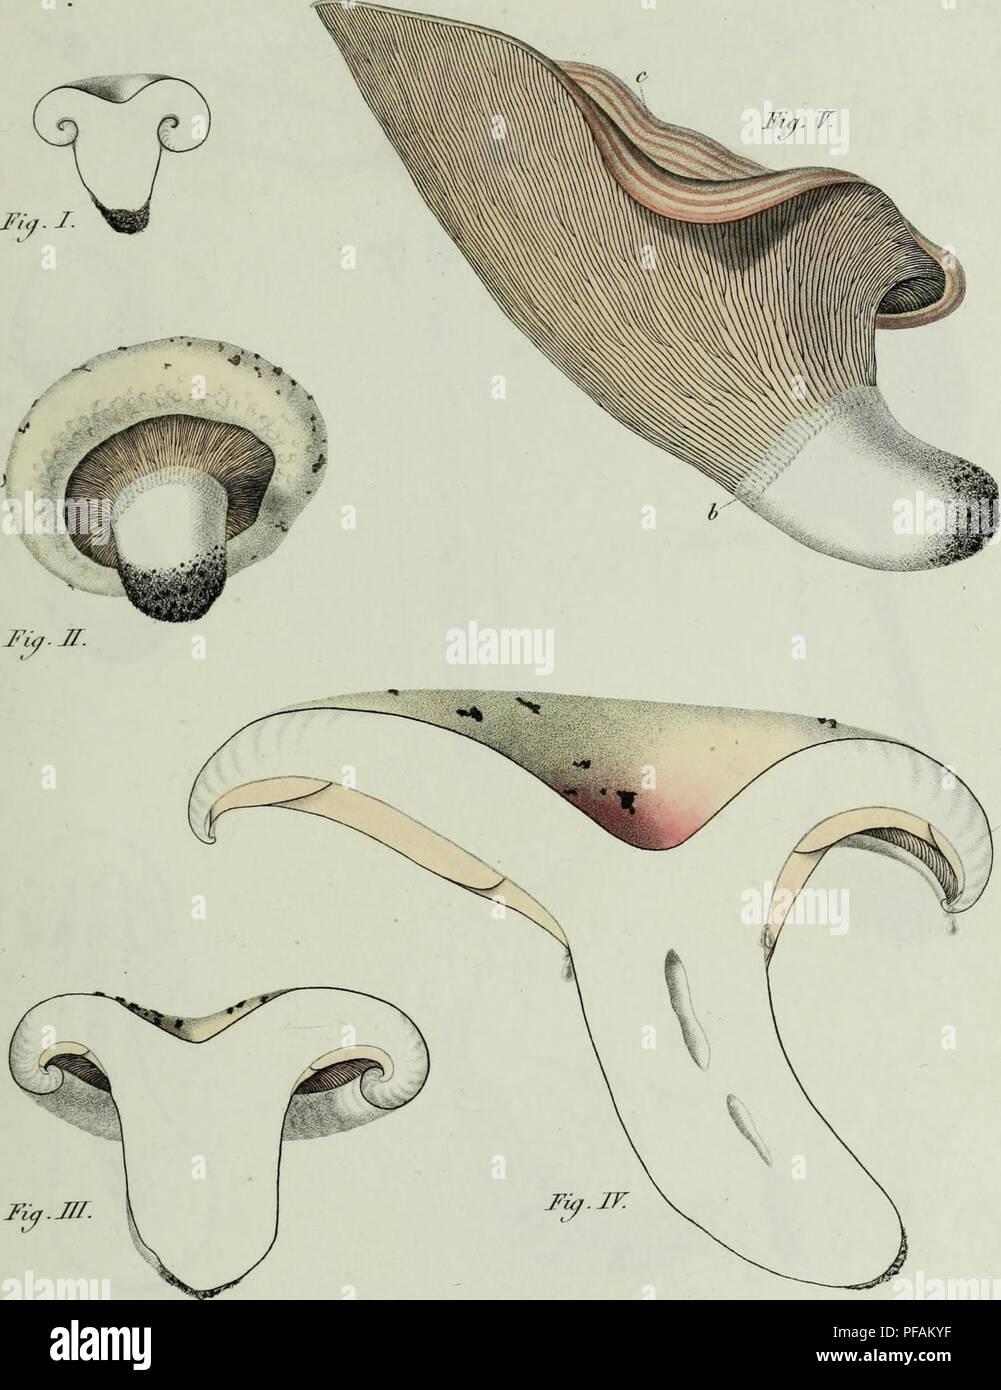 . Descrizione dei funghi mangerecci più comuni dell'Italia e de' velenosi che possono co' medesimi confondersi. Fungi; Mushrooms. T. xxxvn.. r** Irtftit/mi ecc rurtirrtt ( aa/'/et/*/ co7i#rt?v€rtH£*i t lA. Please note that these images are extracted from scanned page images that may have been digitally enhanced for readability - coloration and appearance of these illustrations may not perfectly resemble the original work.. Vittadini, Carlo; Cavagna Sangiuliani di Gualdana, Antonio, conte, 1843-1913, former owner. IU-R. Milano, Rusconi - Stock Image